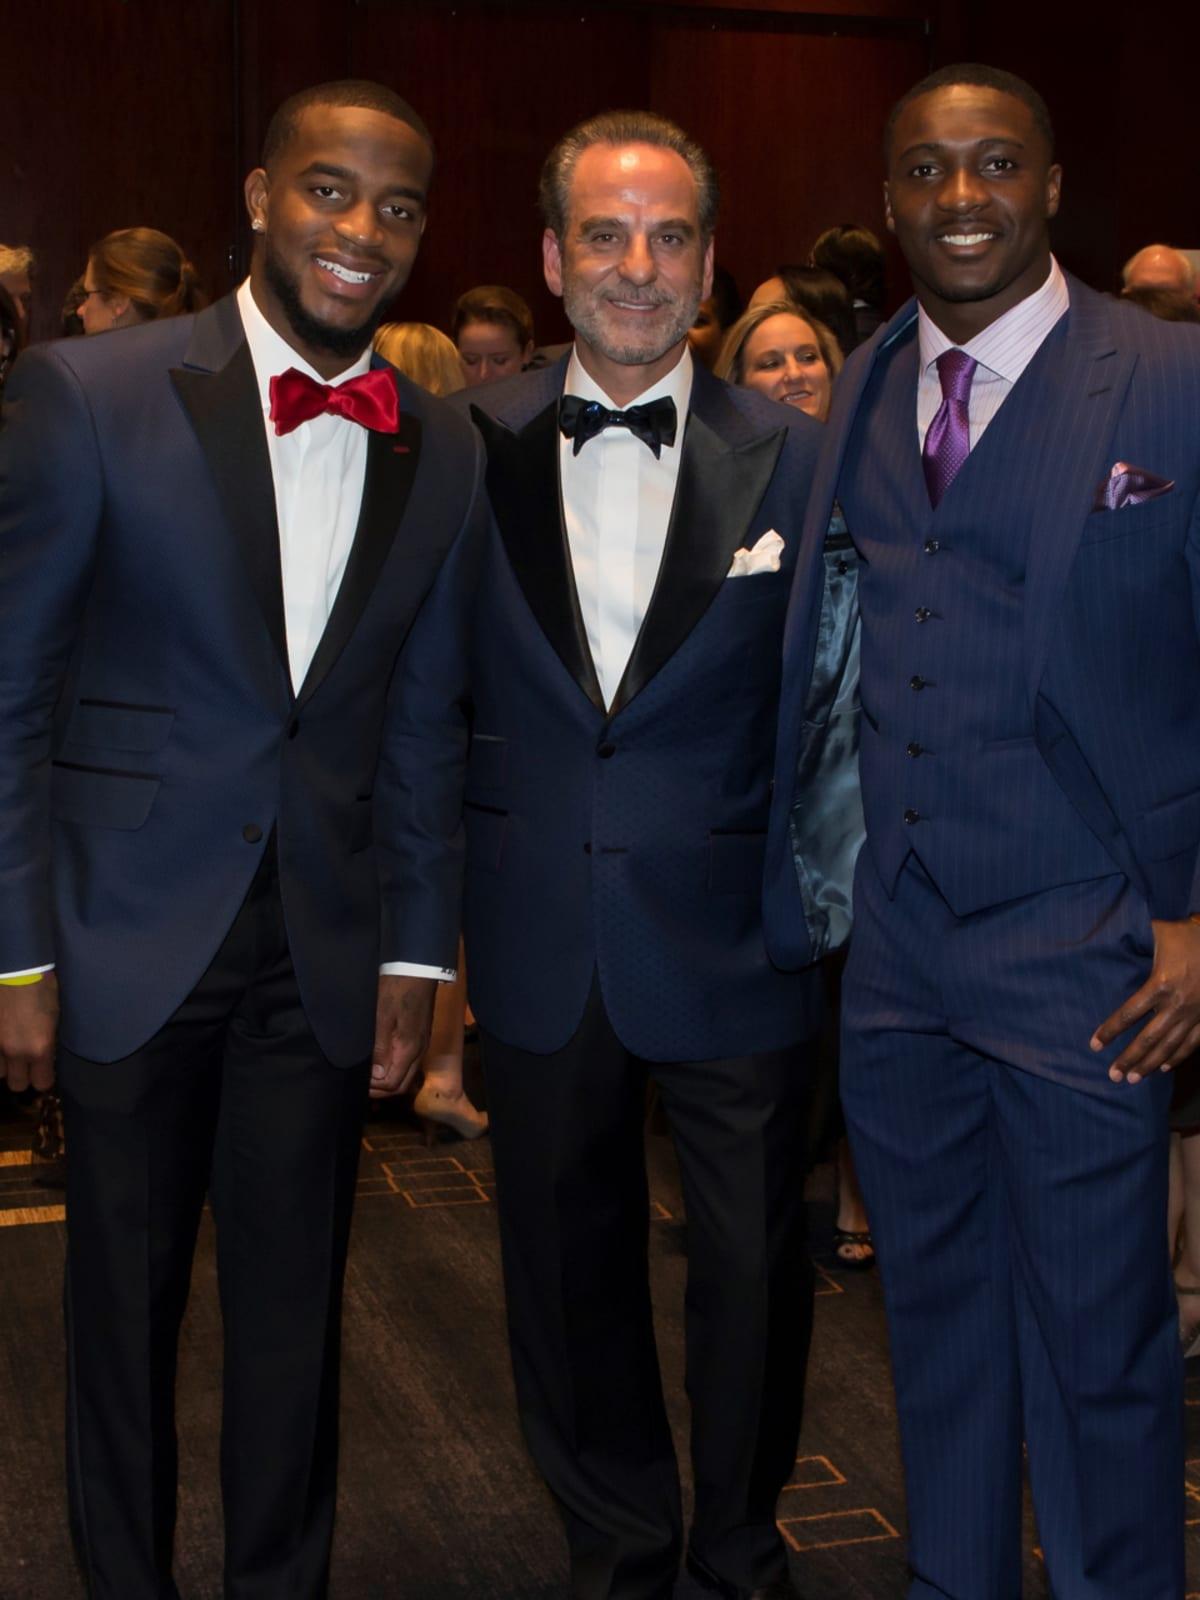 Una Notte in Italia Houston Texan Kareem Jackson, Rudy Festari, Houston Texan Andre Hal